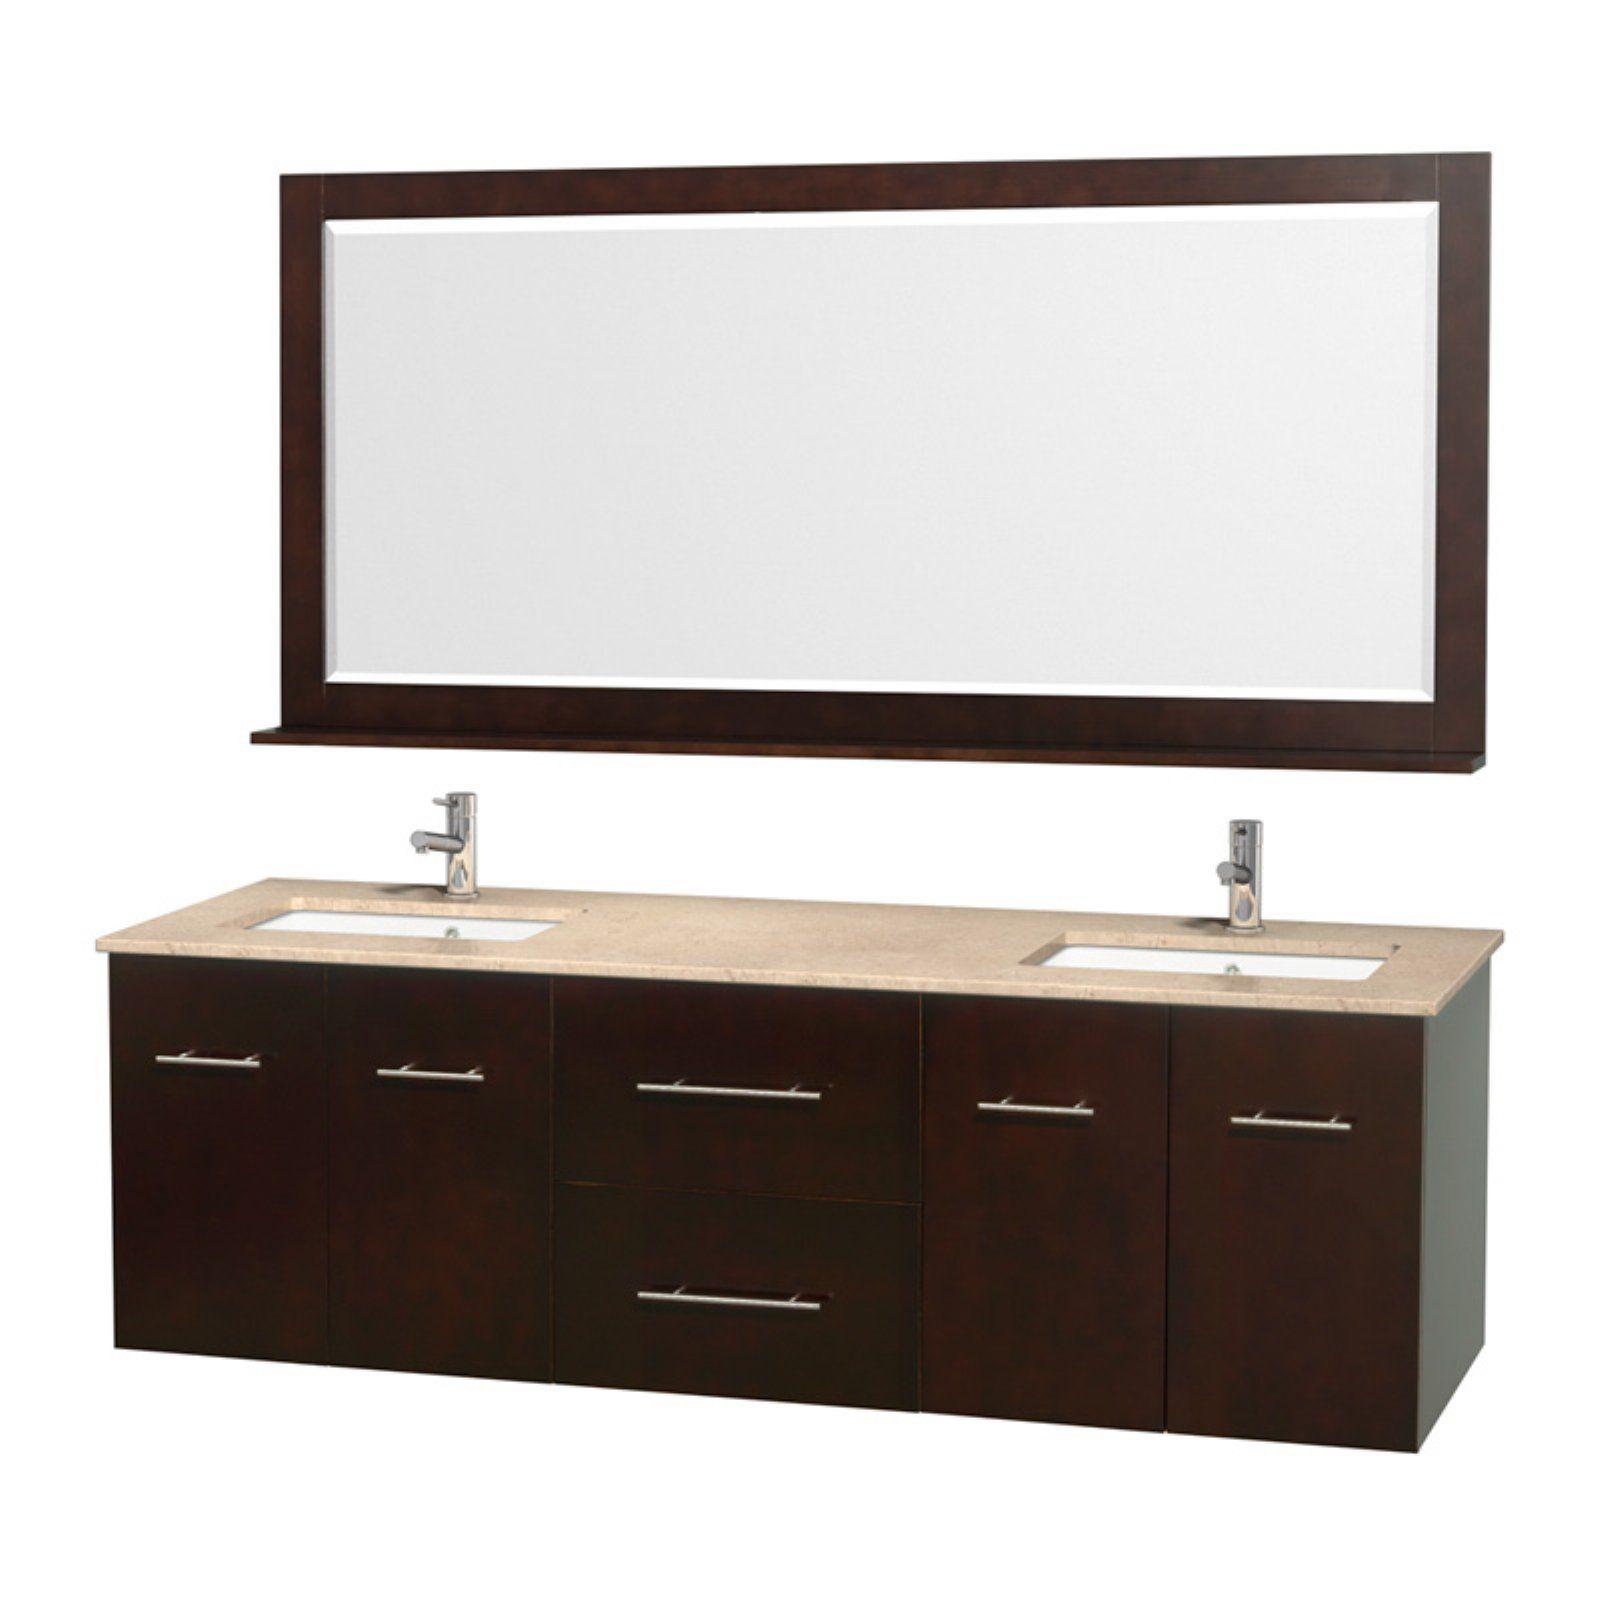 Wyndham Collection Wcvw00972des Centra 72 In Double Bathroom